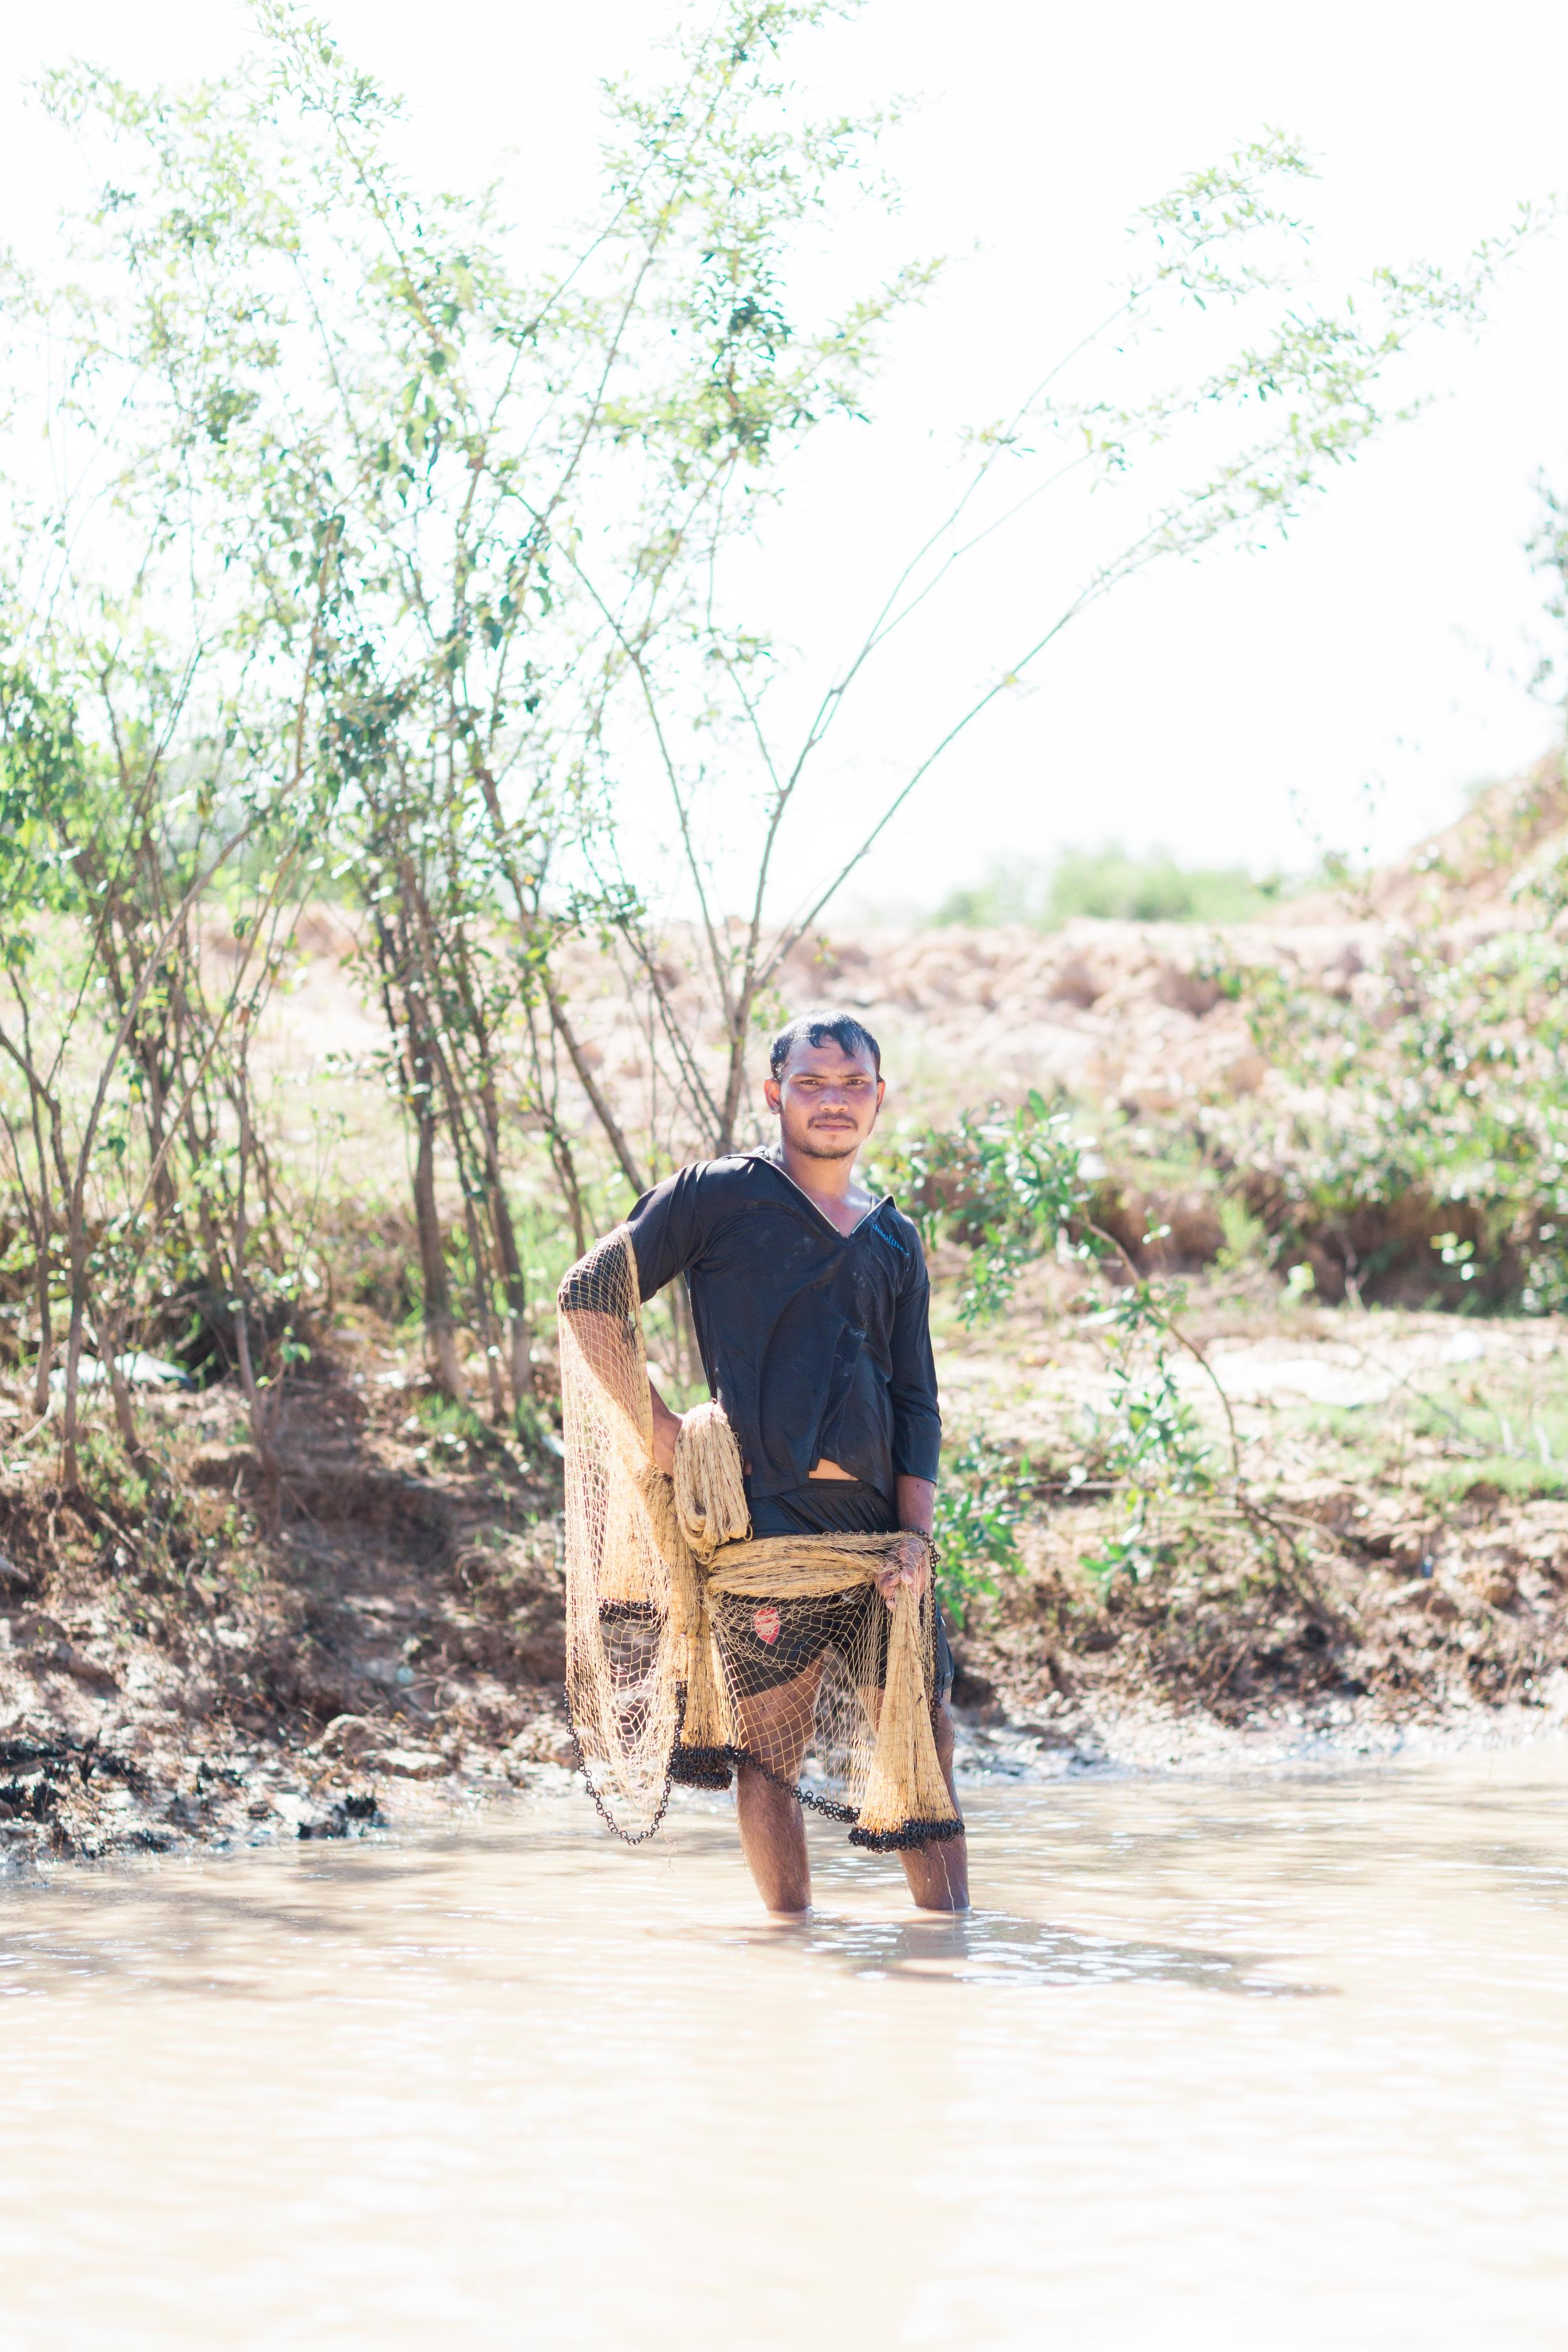 Cari Zhu Photography - Cambodia Siem Reap South East Asia Travel-1679.jpg